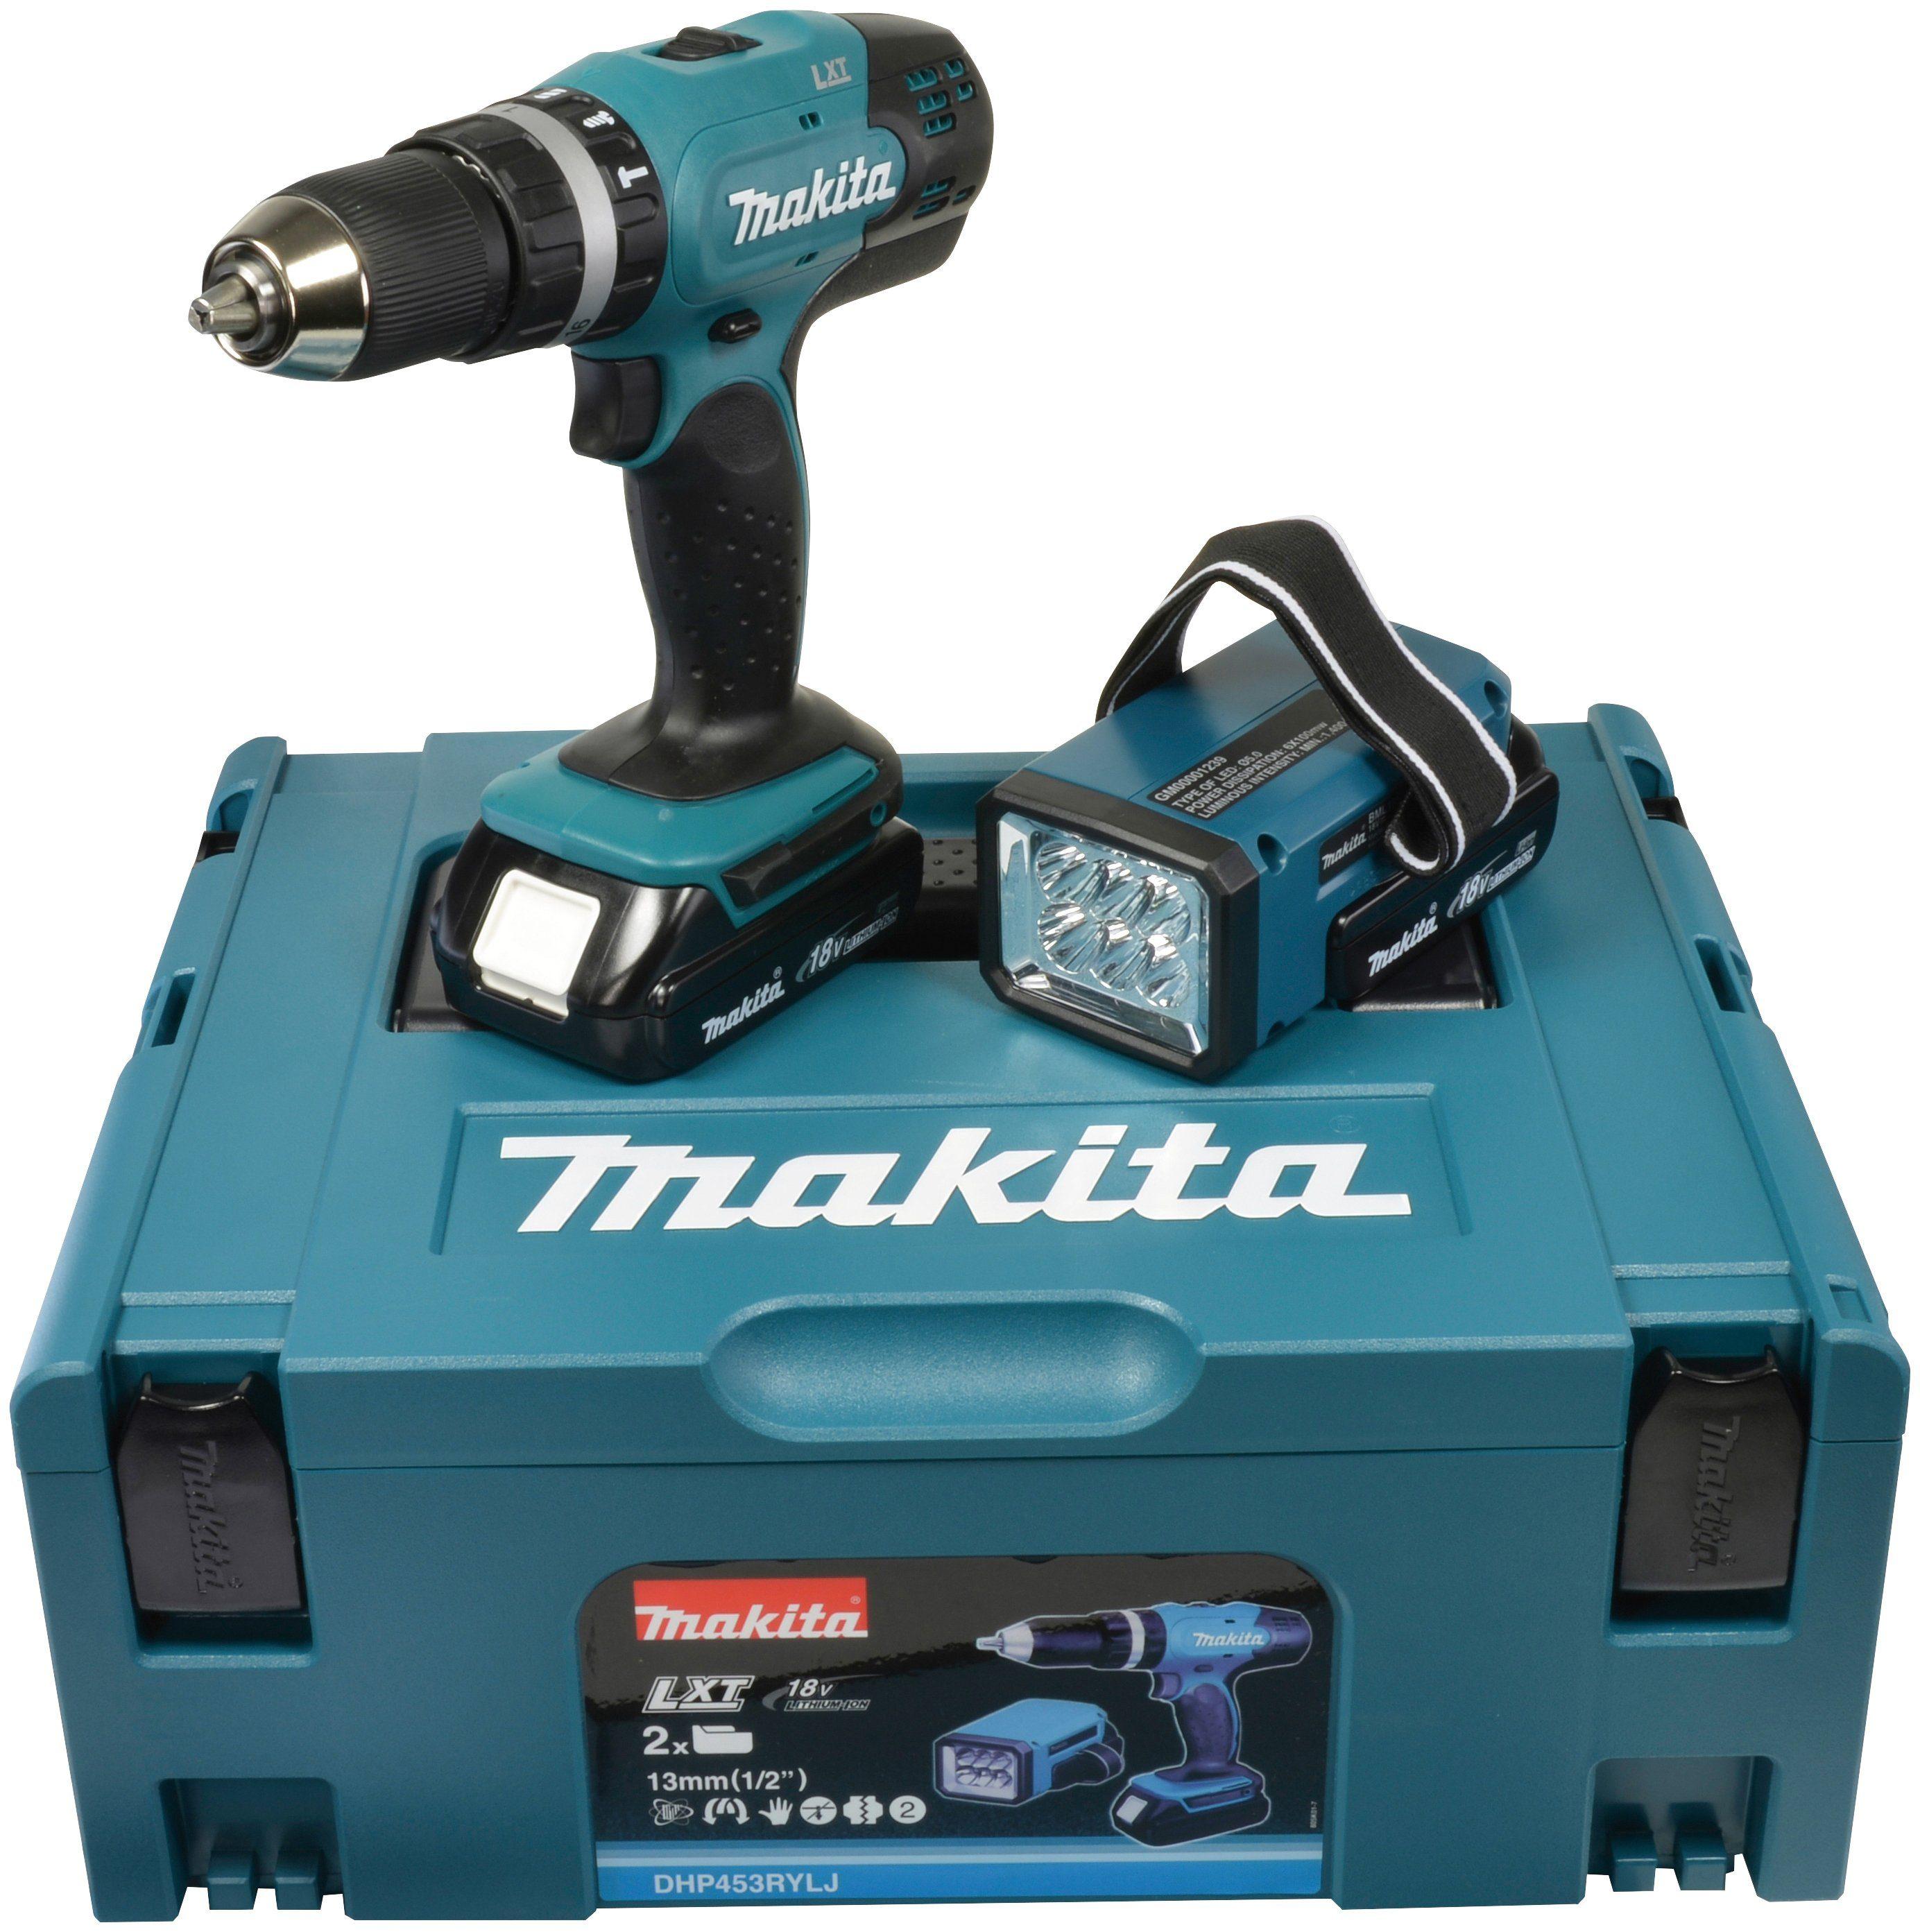 MAKITA Akku-Schlagbohrschrauber »DHP453RYLJ«, 42 Nm, inkl. 2 Akkus (18 V, 1,5 Ah), Ladegerät, Lampe